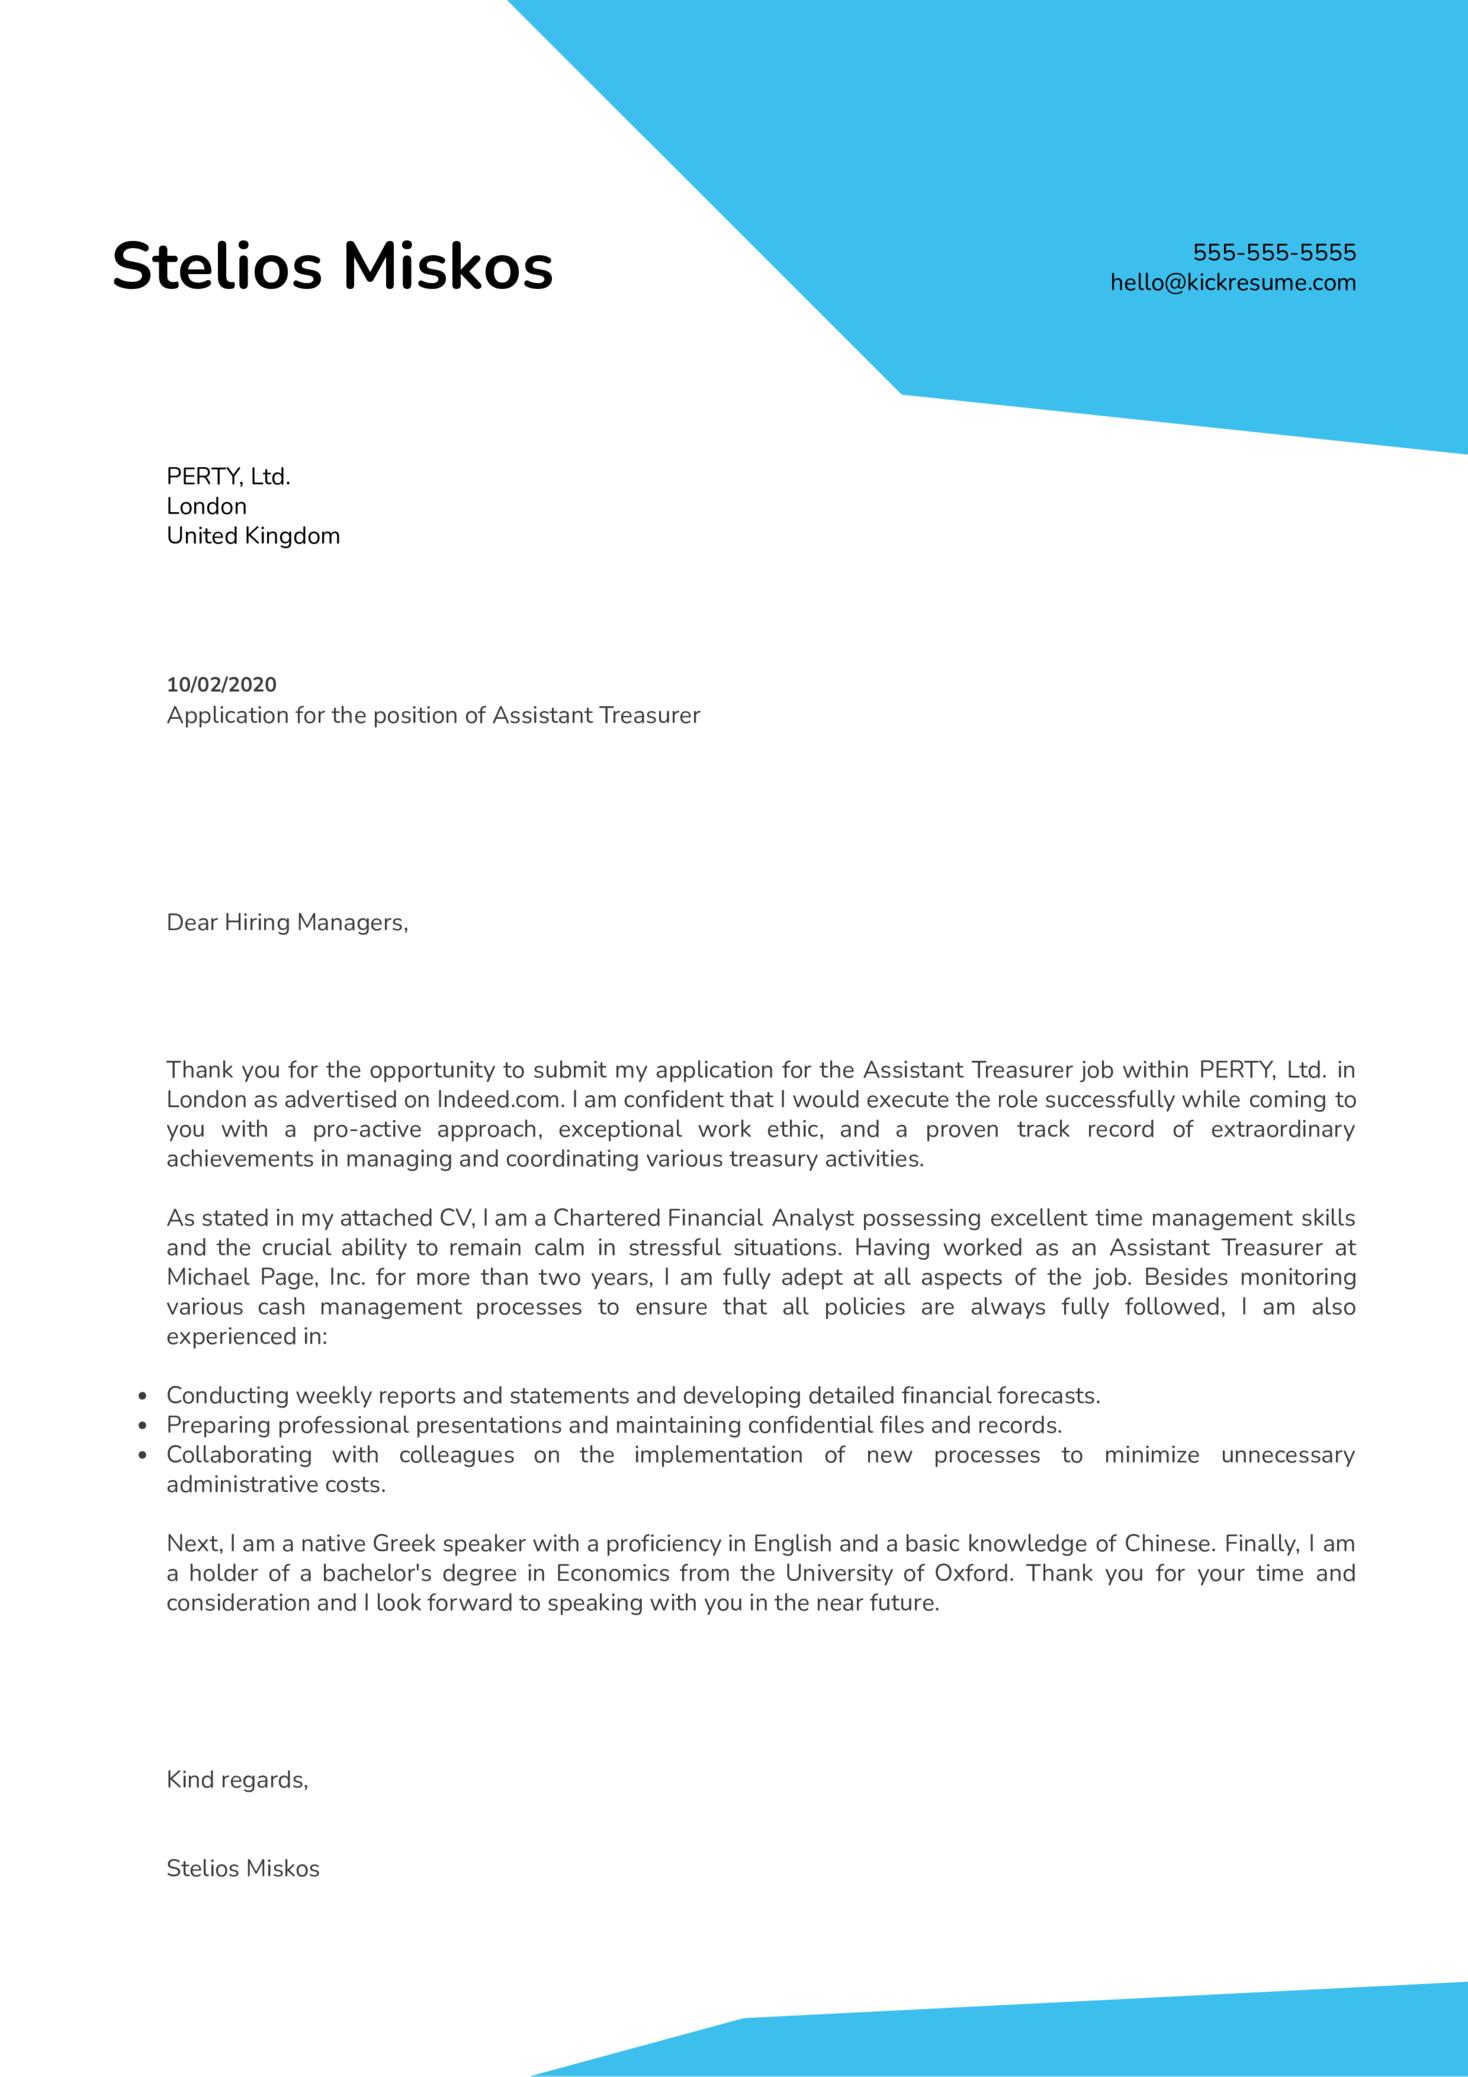 Assistant Treasurer Cover Letter Sample